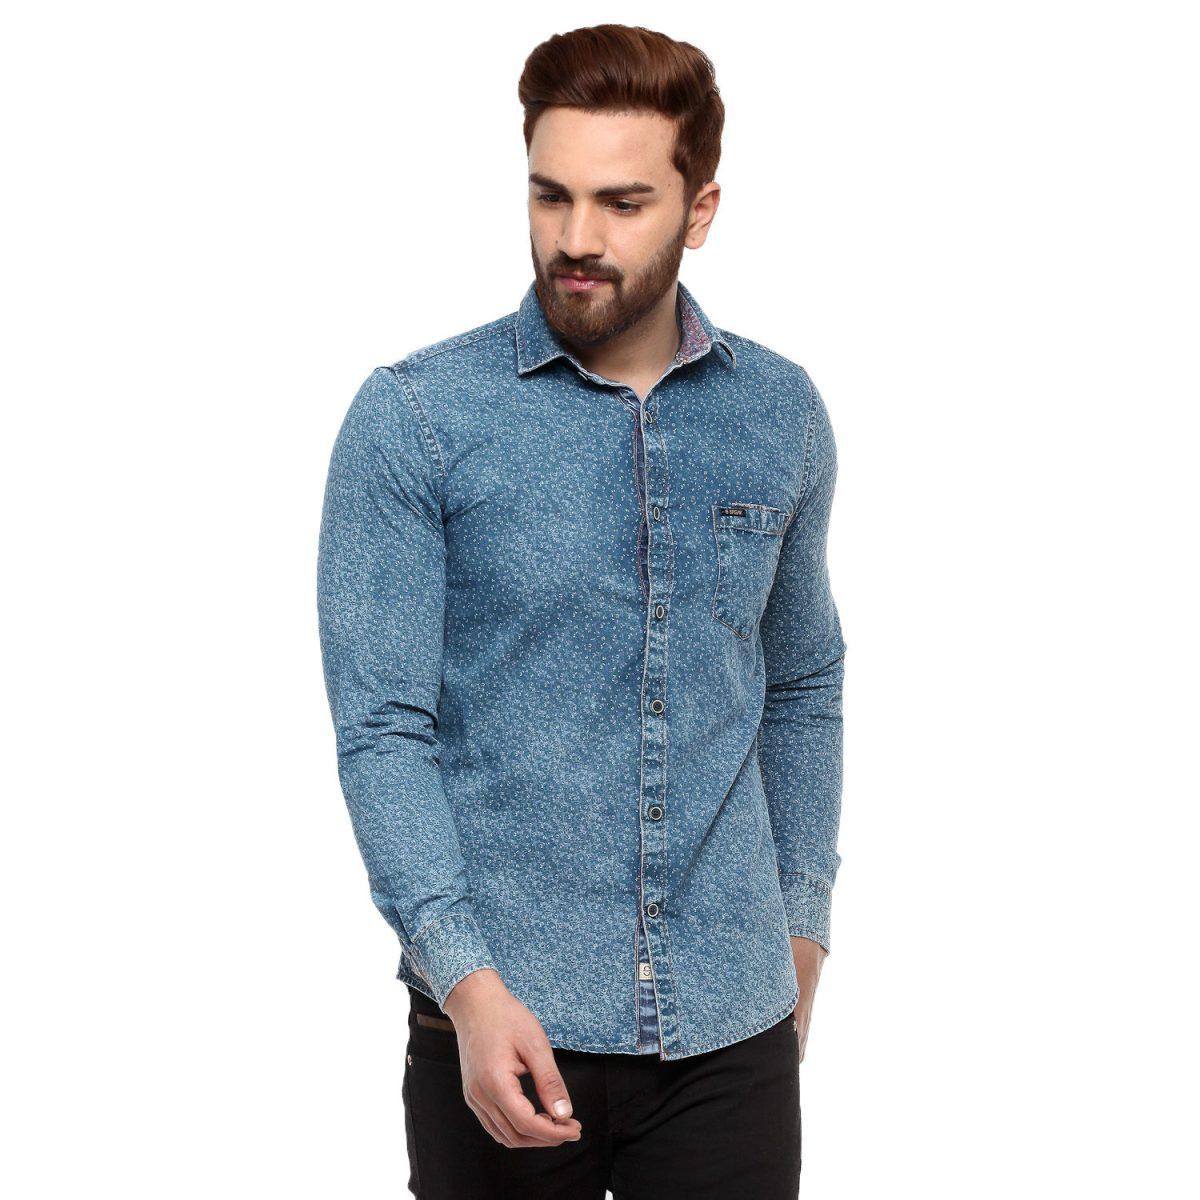 Denim Shirt manufacturer from Bangladesh